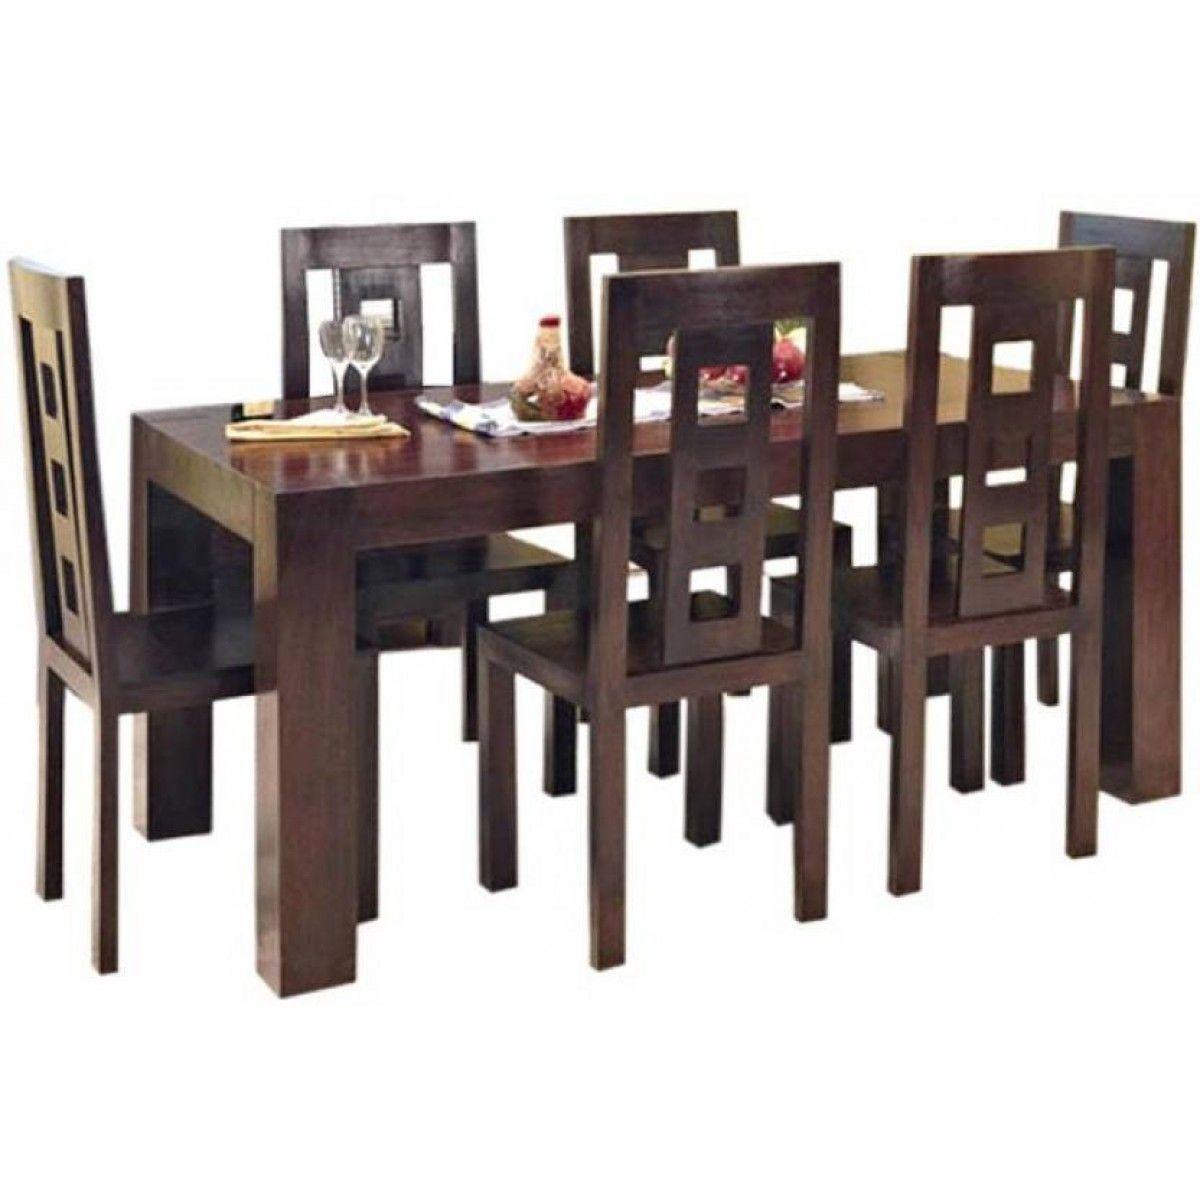 Teak Wood Dining Table Online